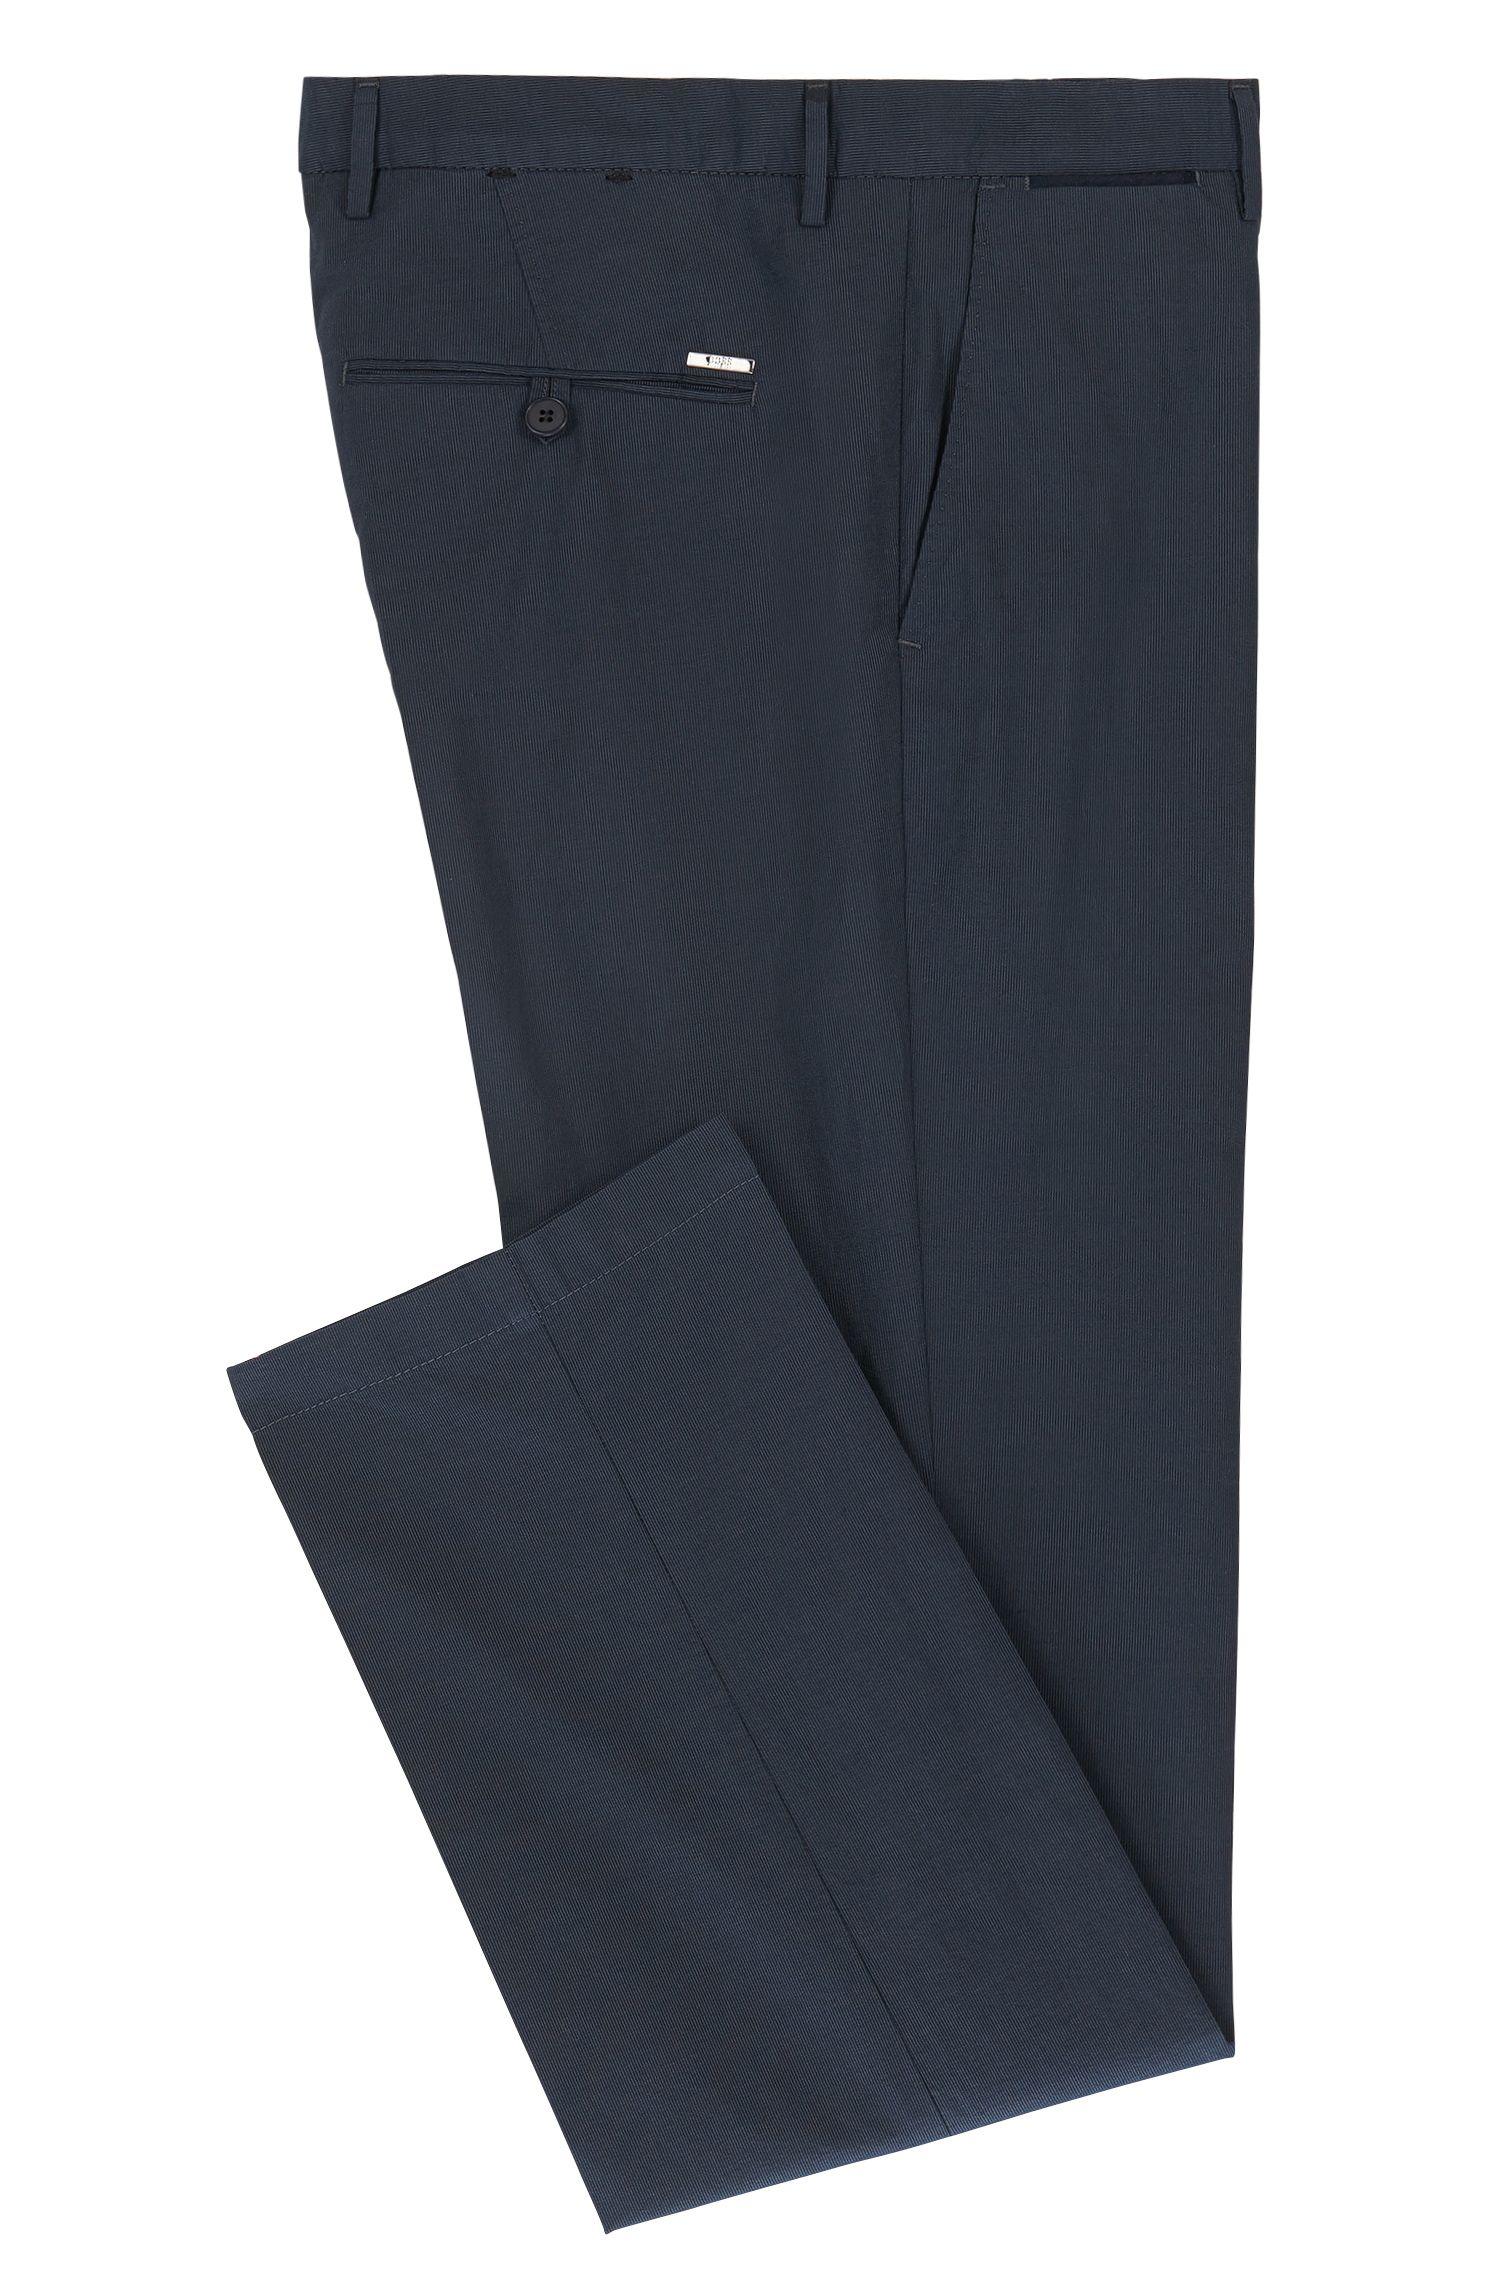 Cotton-Silk Pant, Regular Fit | Crigan Luxe W, Dark Blue